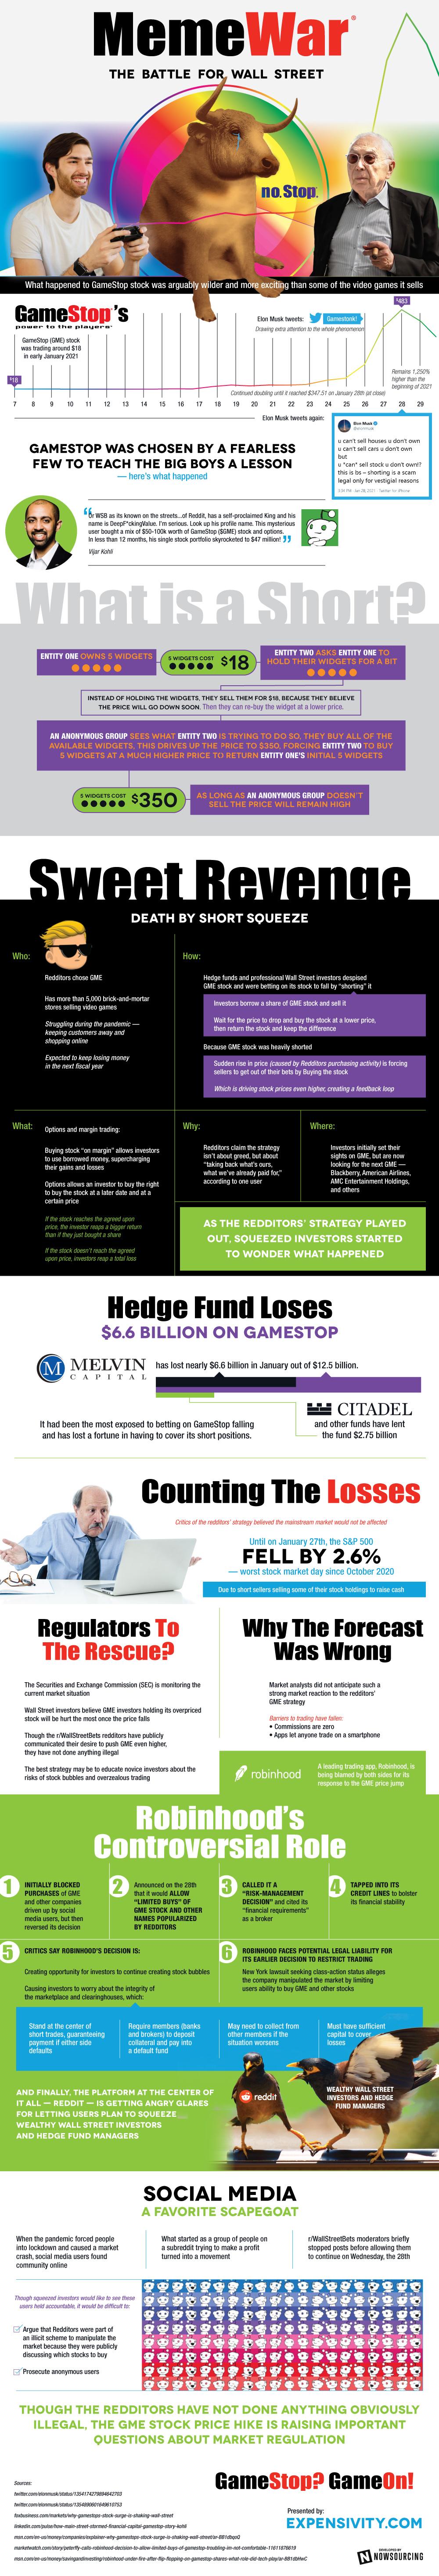 Wall Street infographic social media